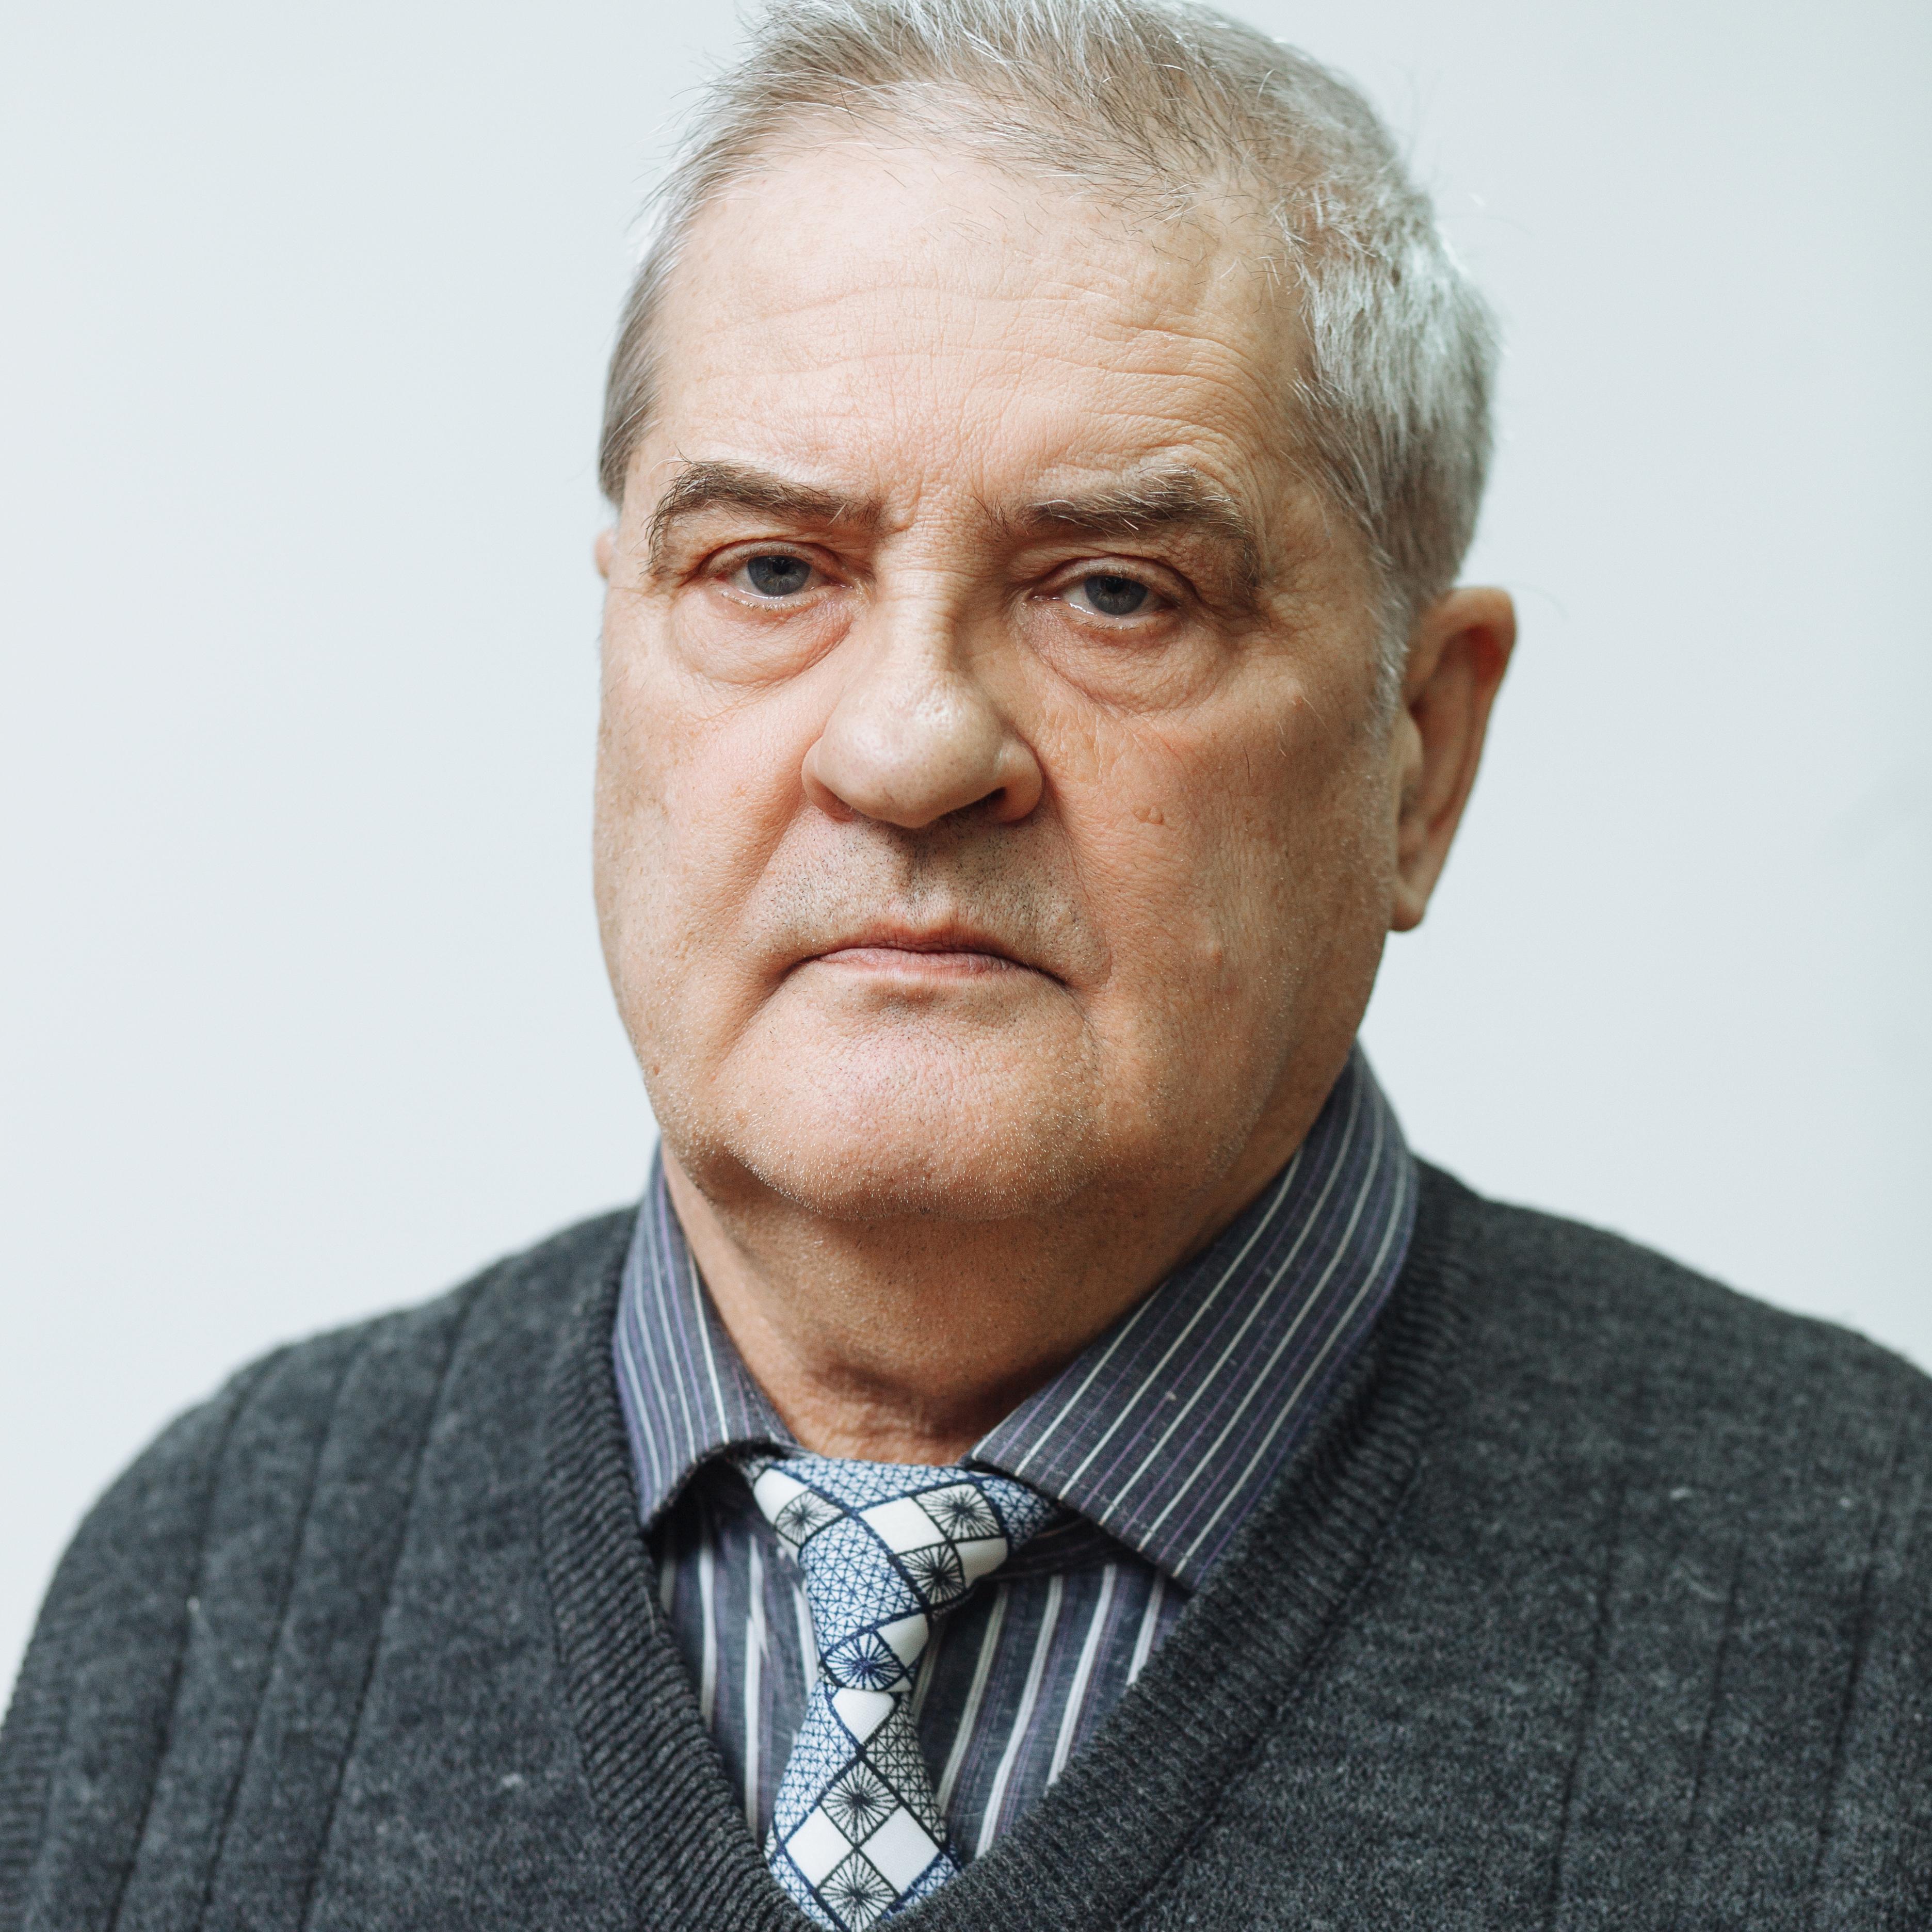 Матвеев Юрий Александрович